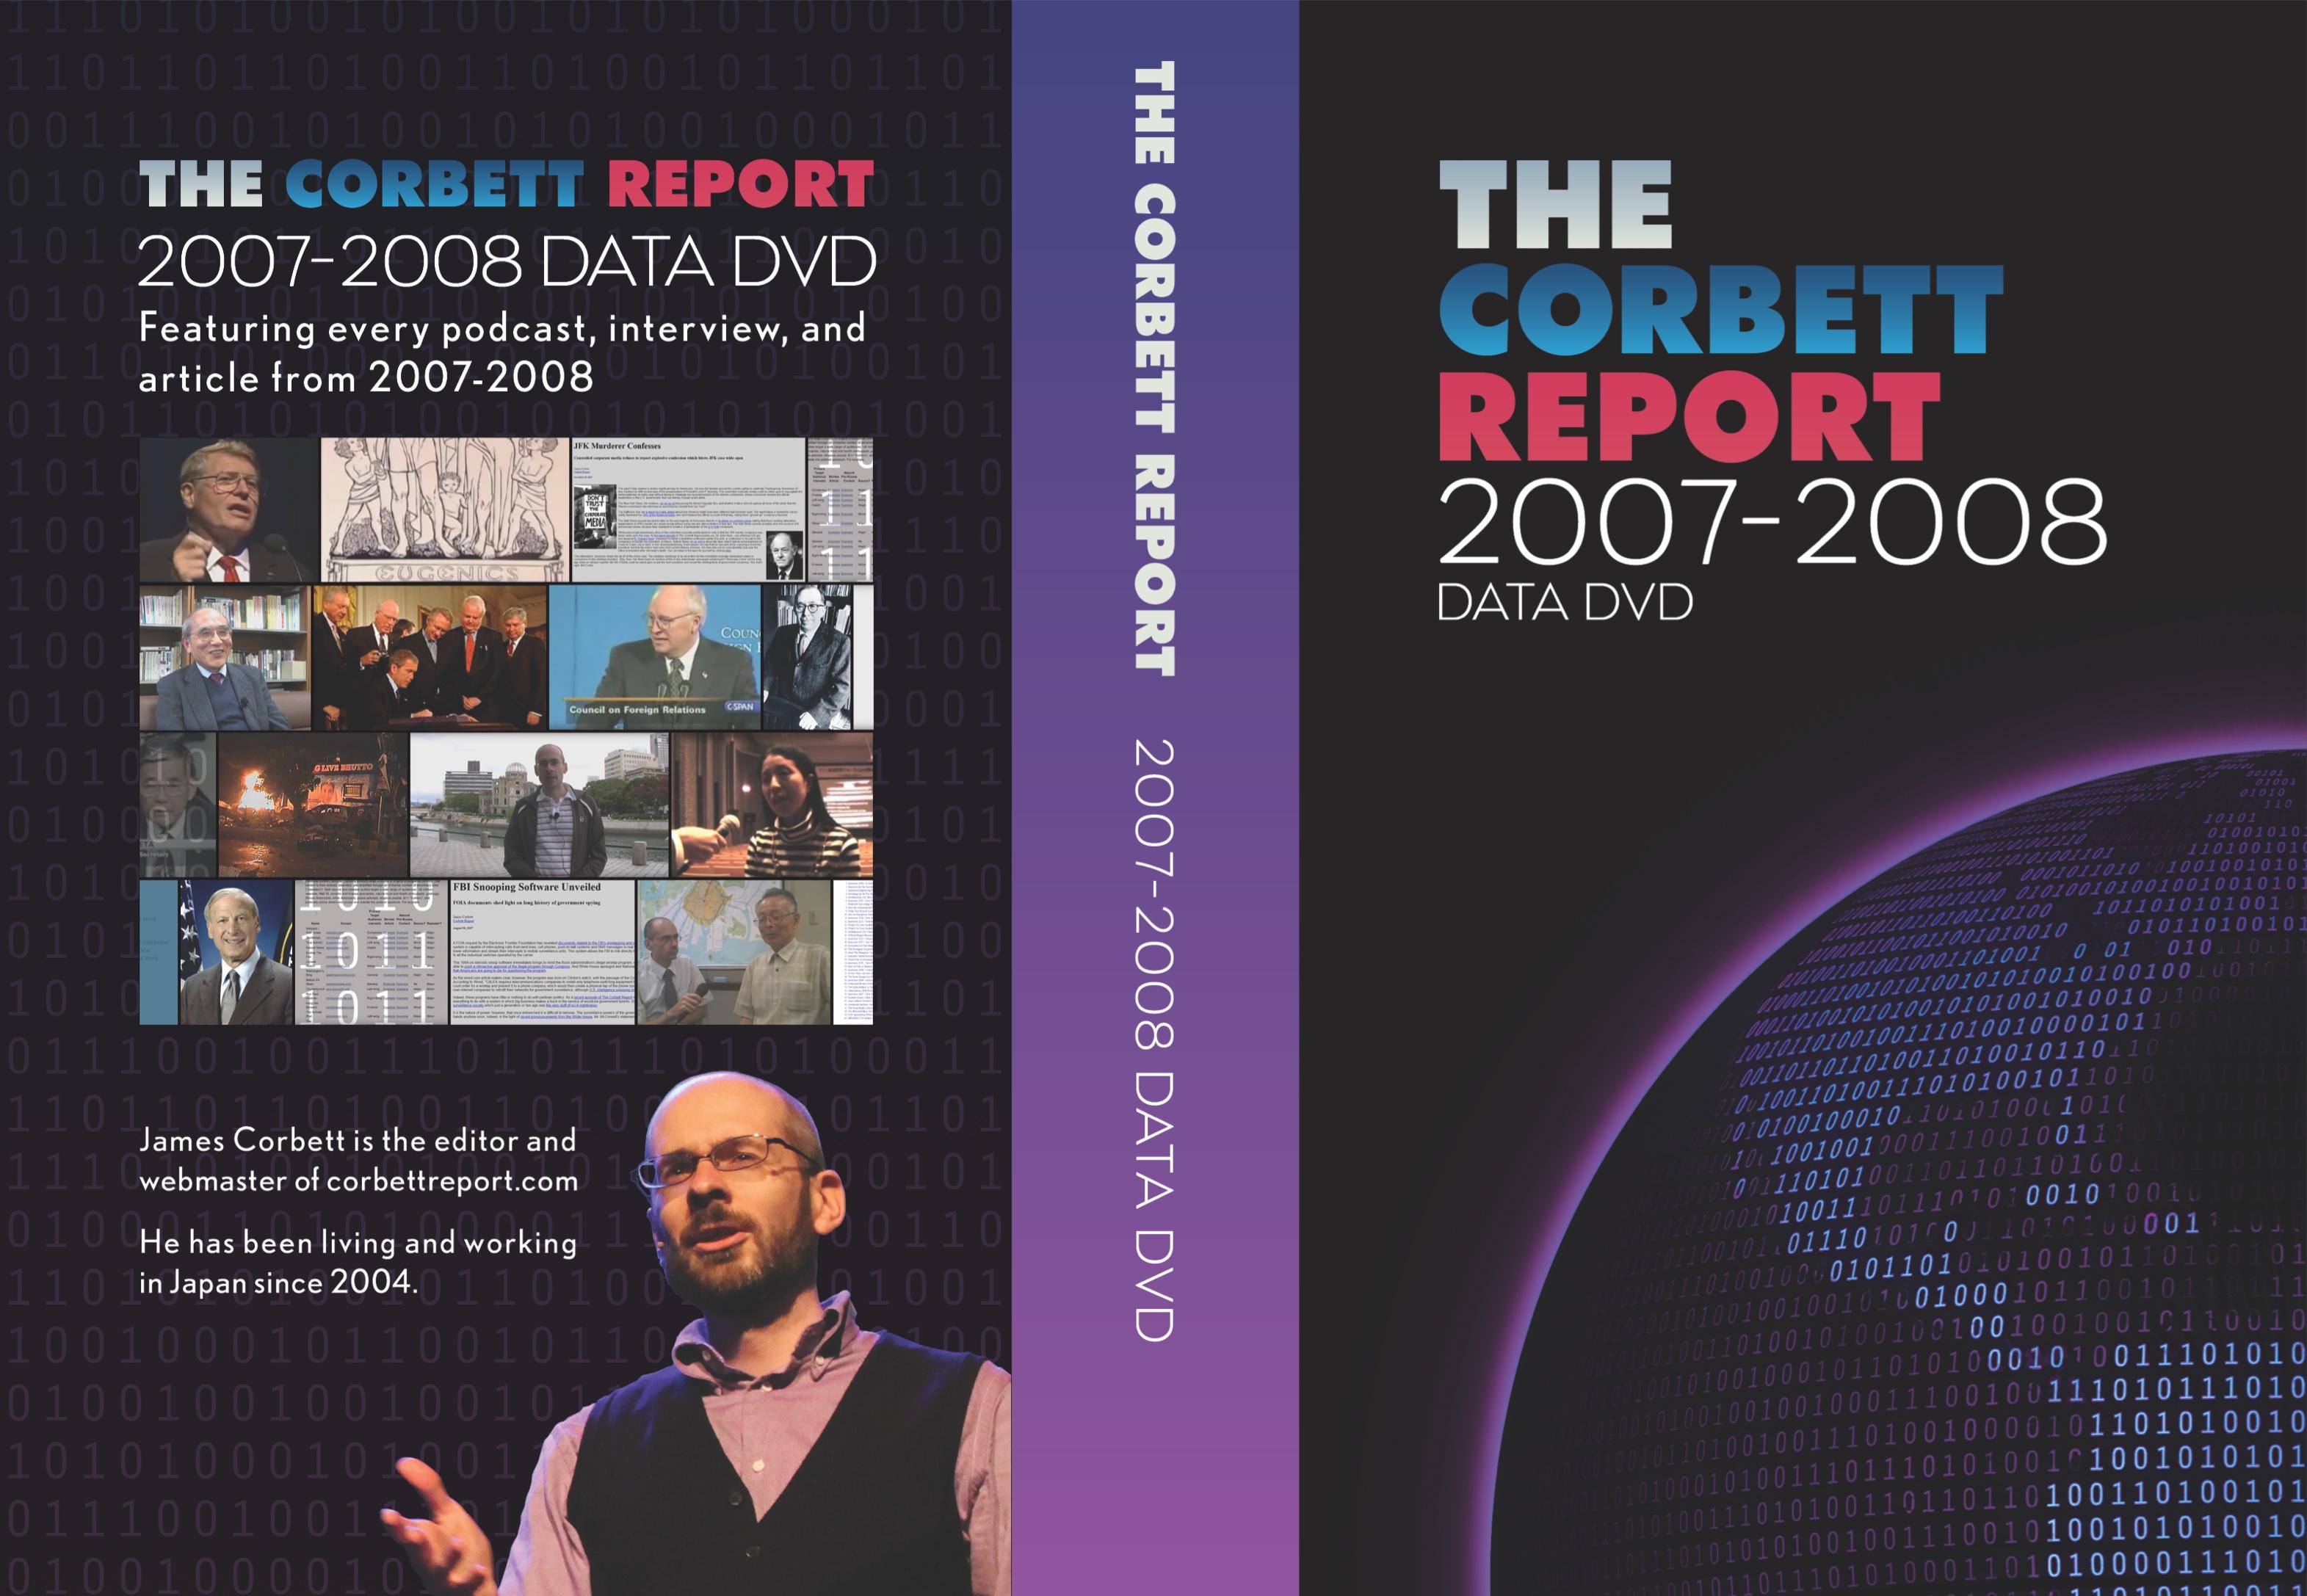 Data DVD 2007-2008